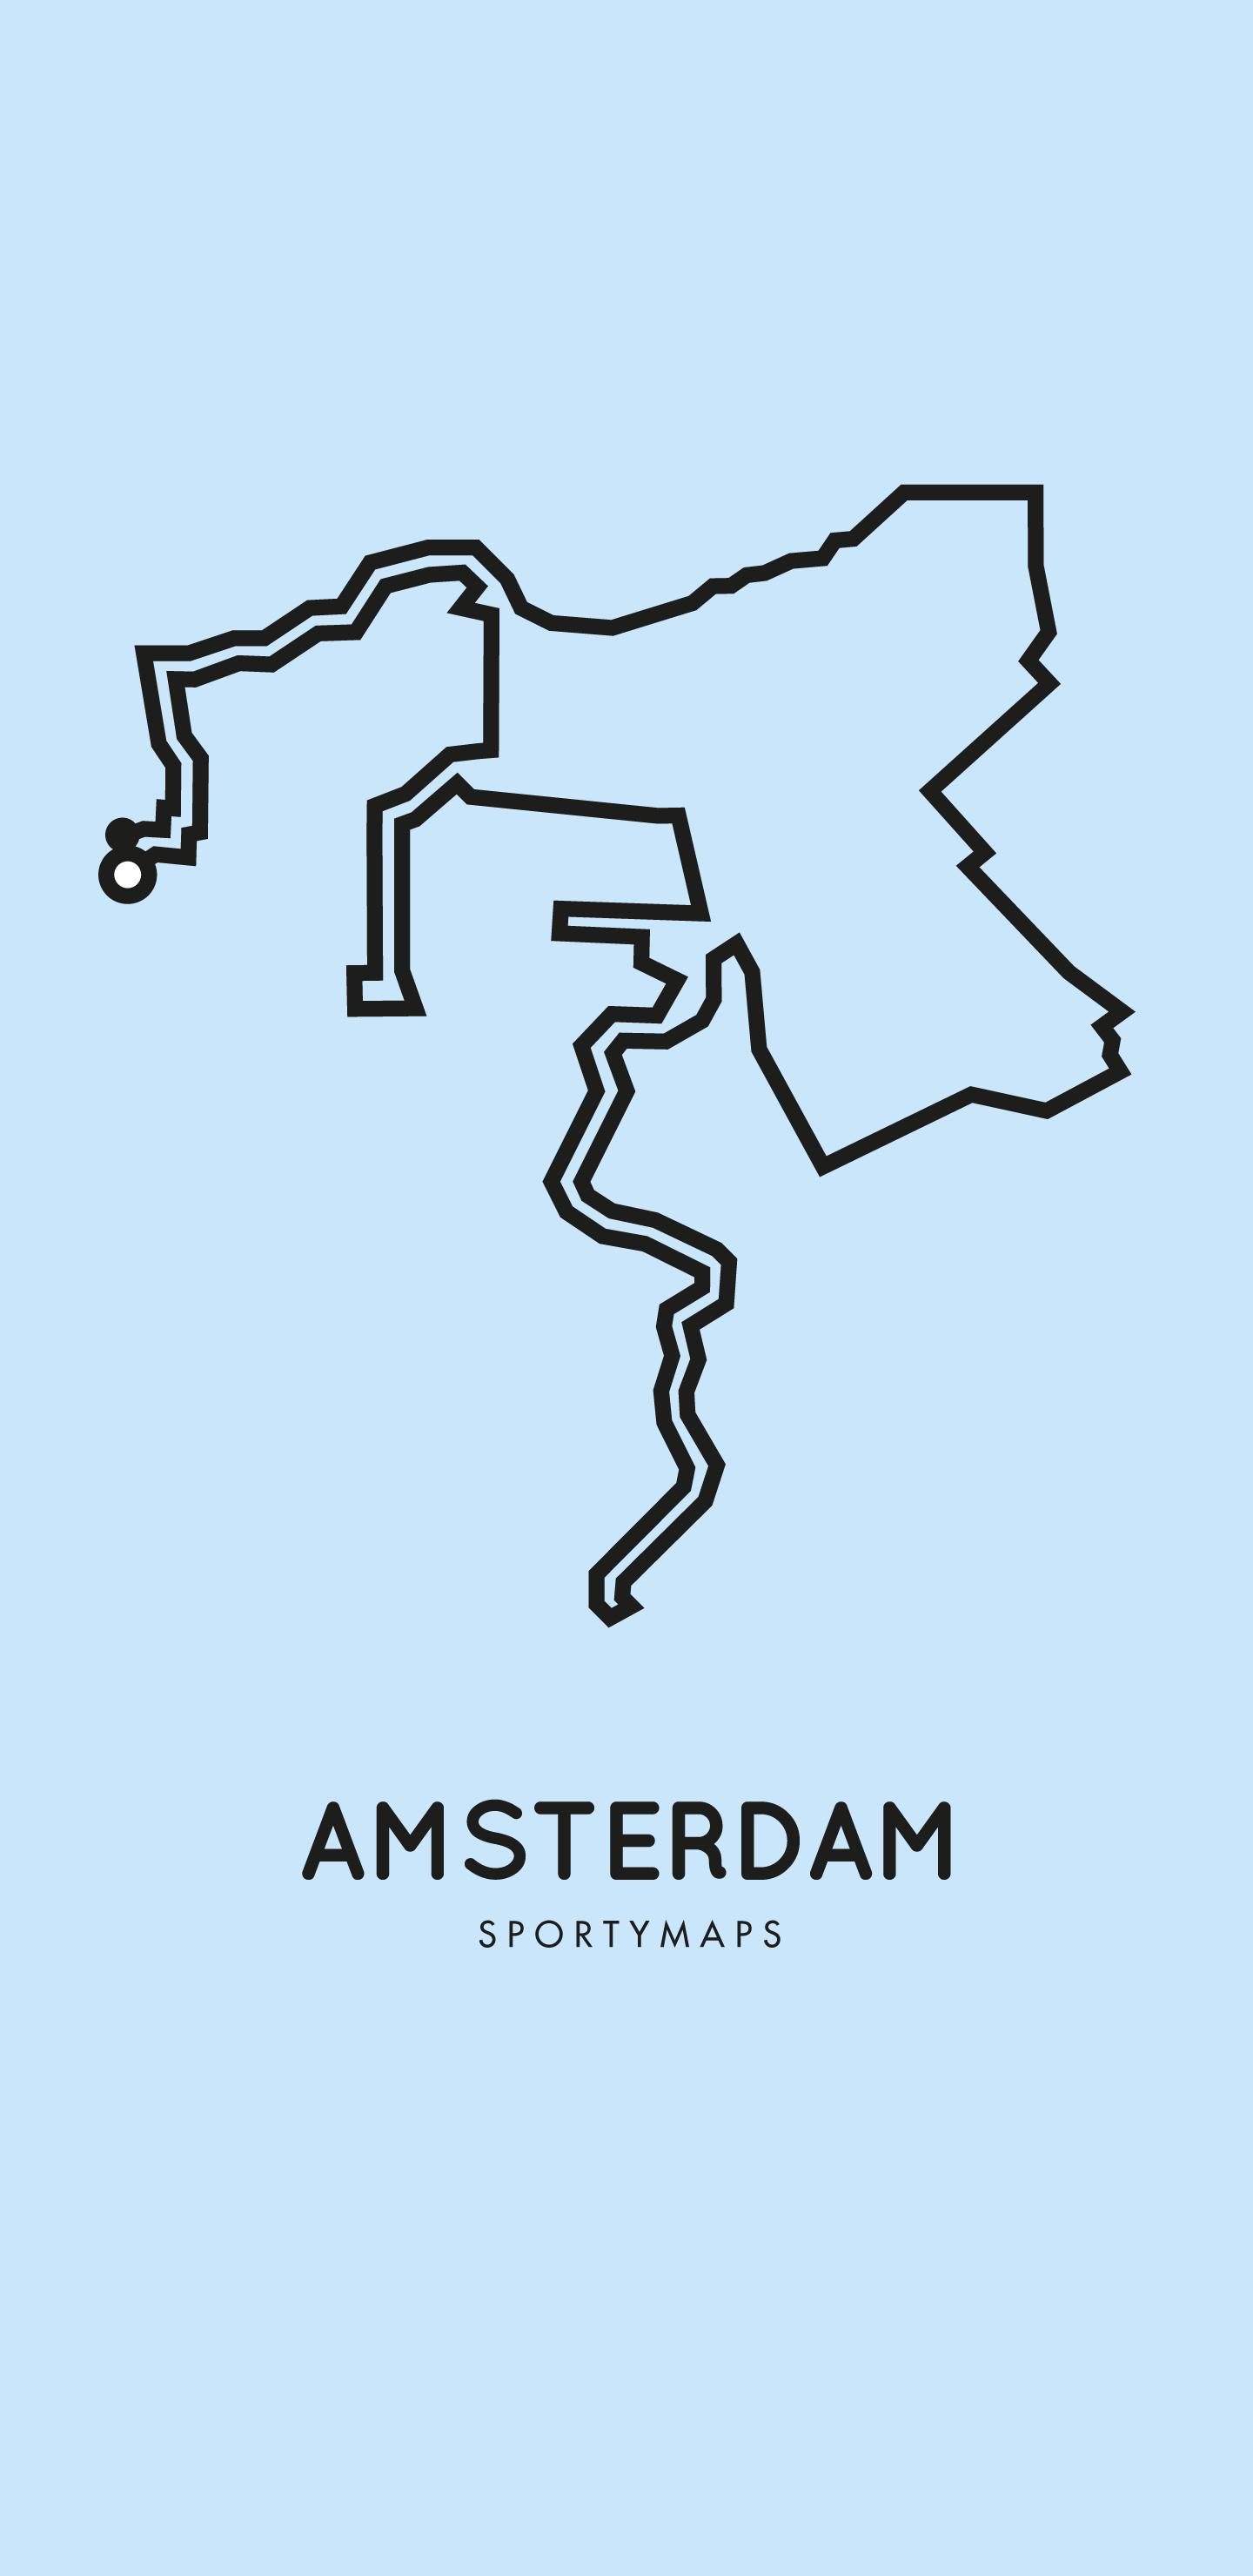 Sportymaps-Amsterdam-marathon-blue